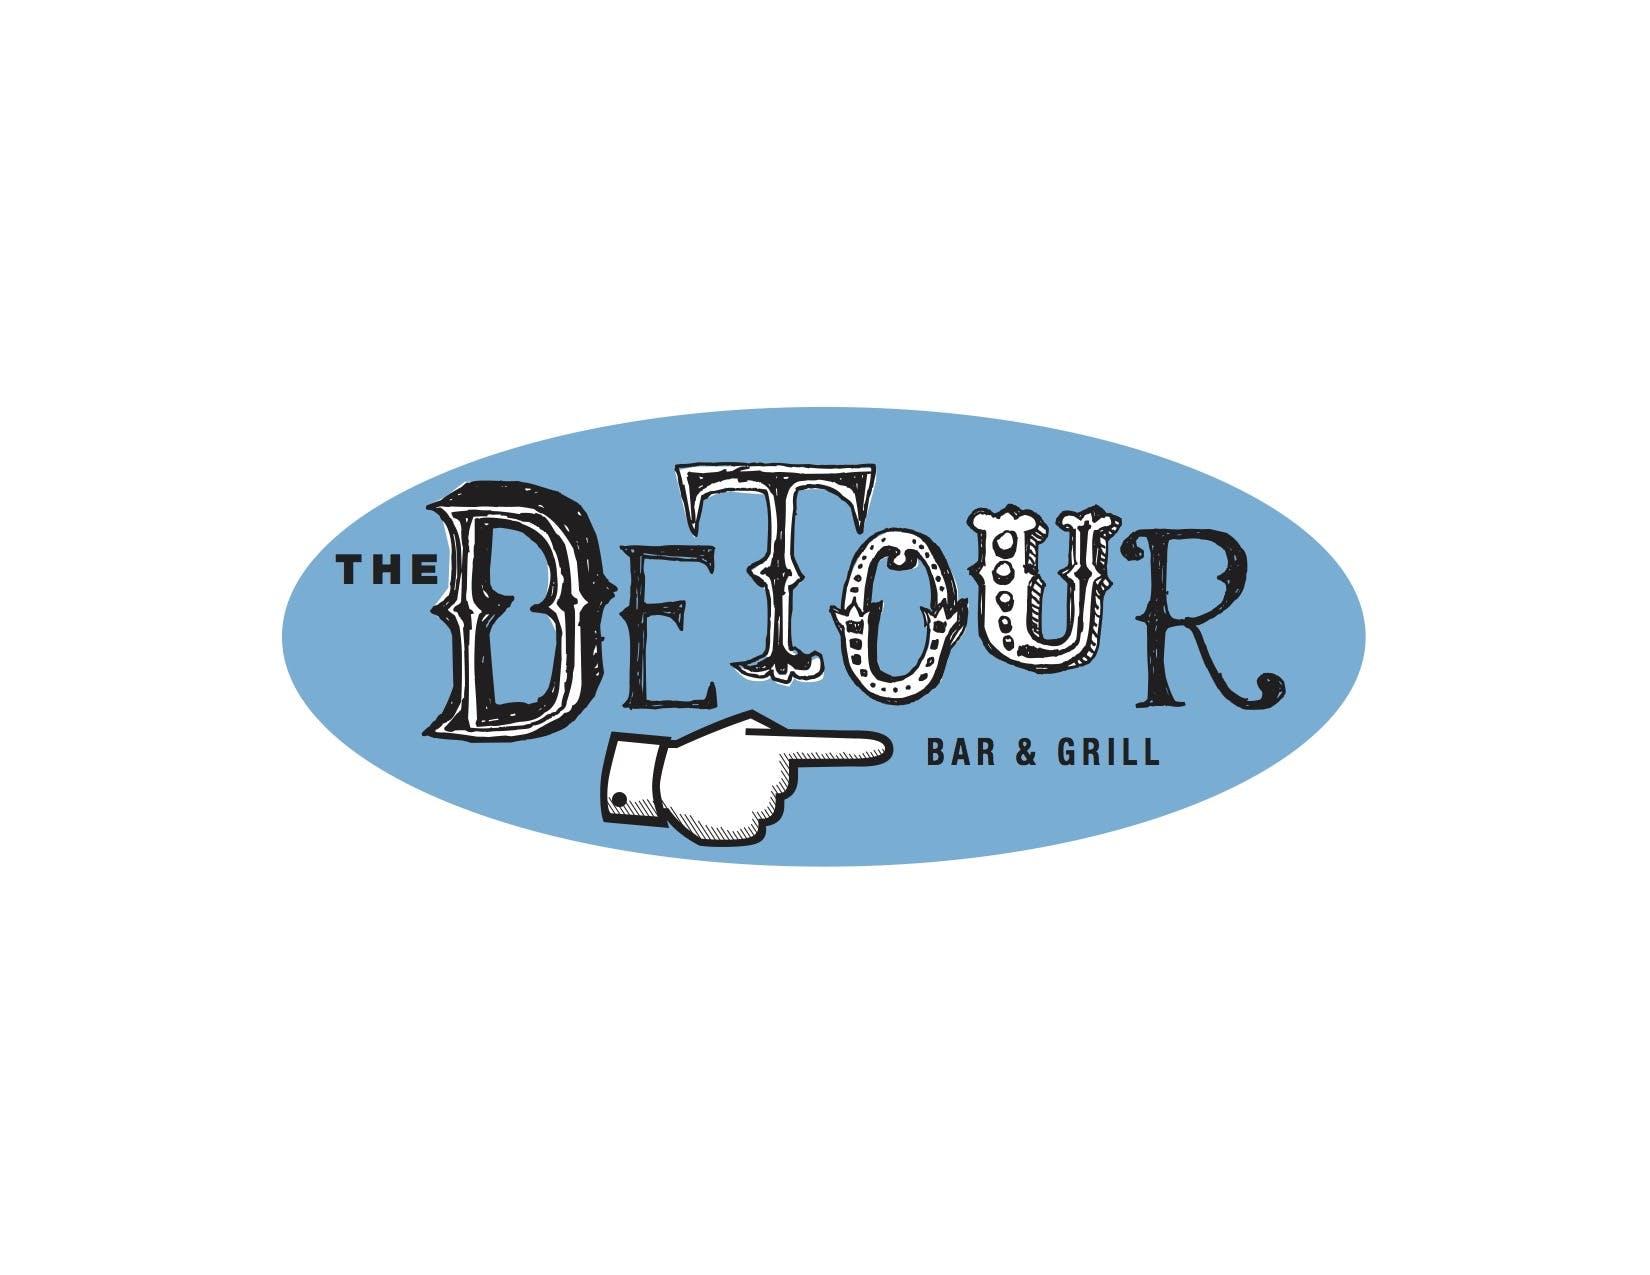 The Detour Bar & Grill Loves Park